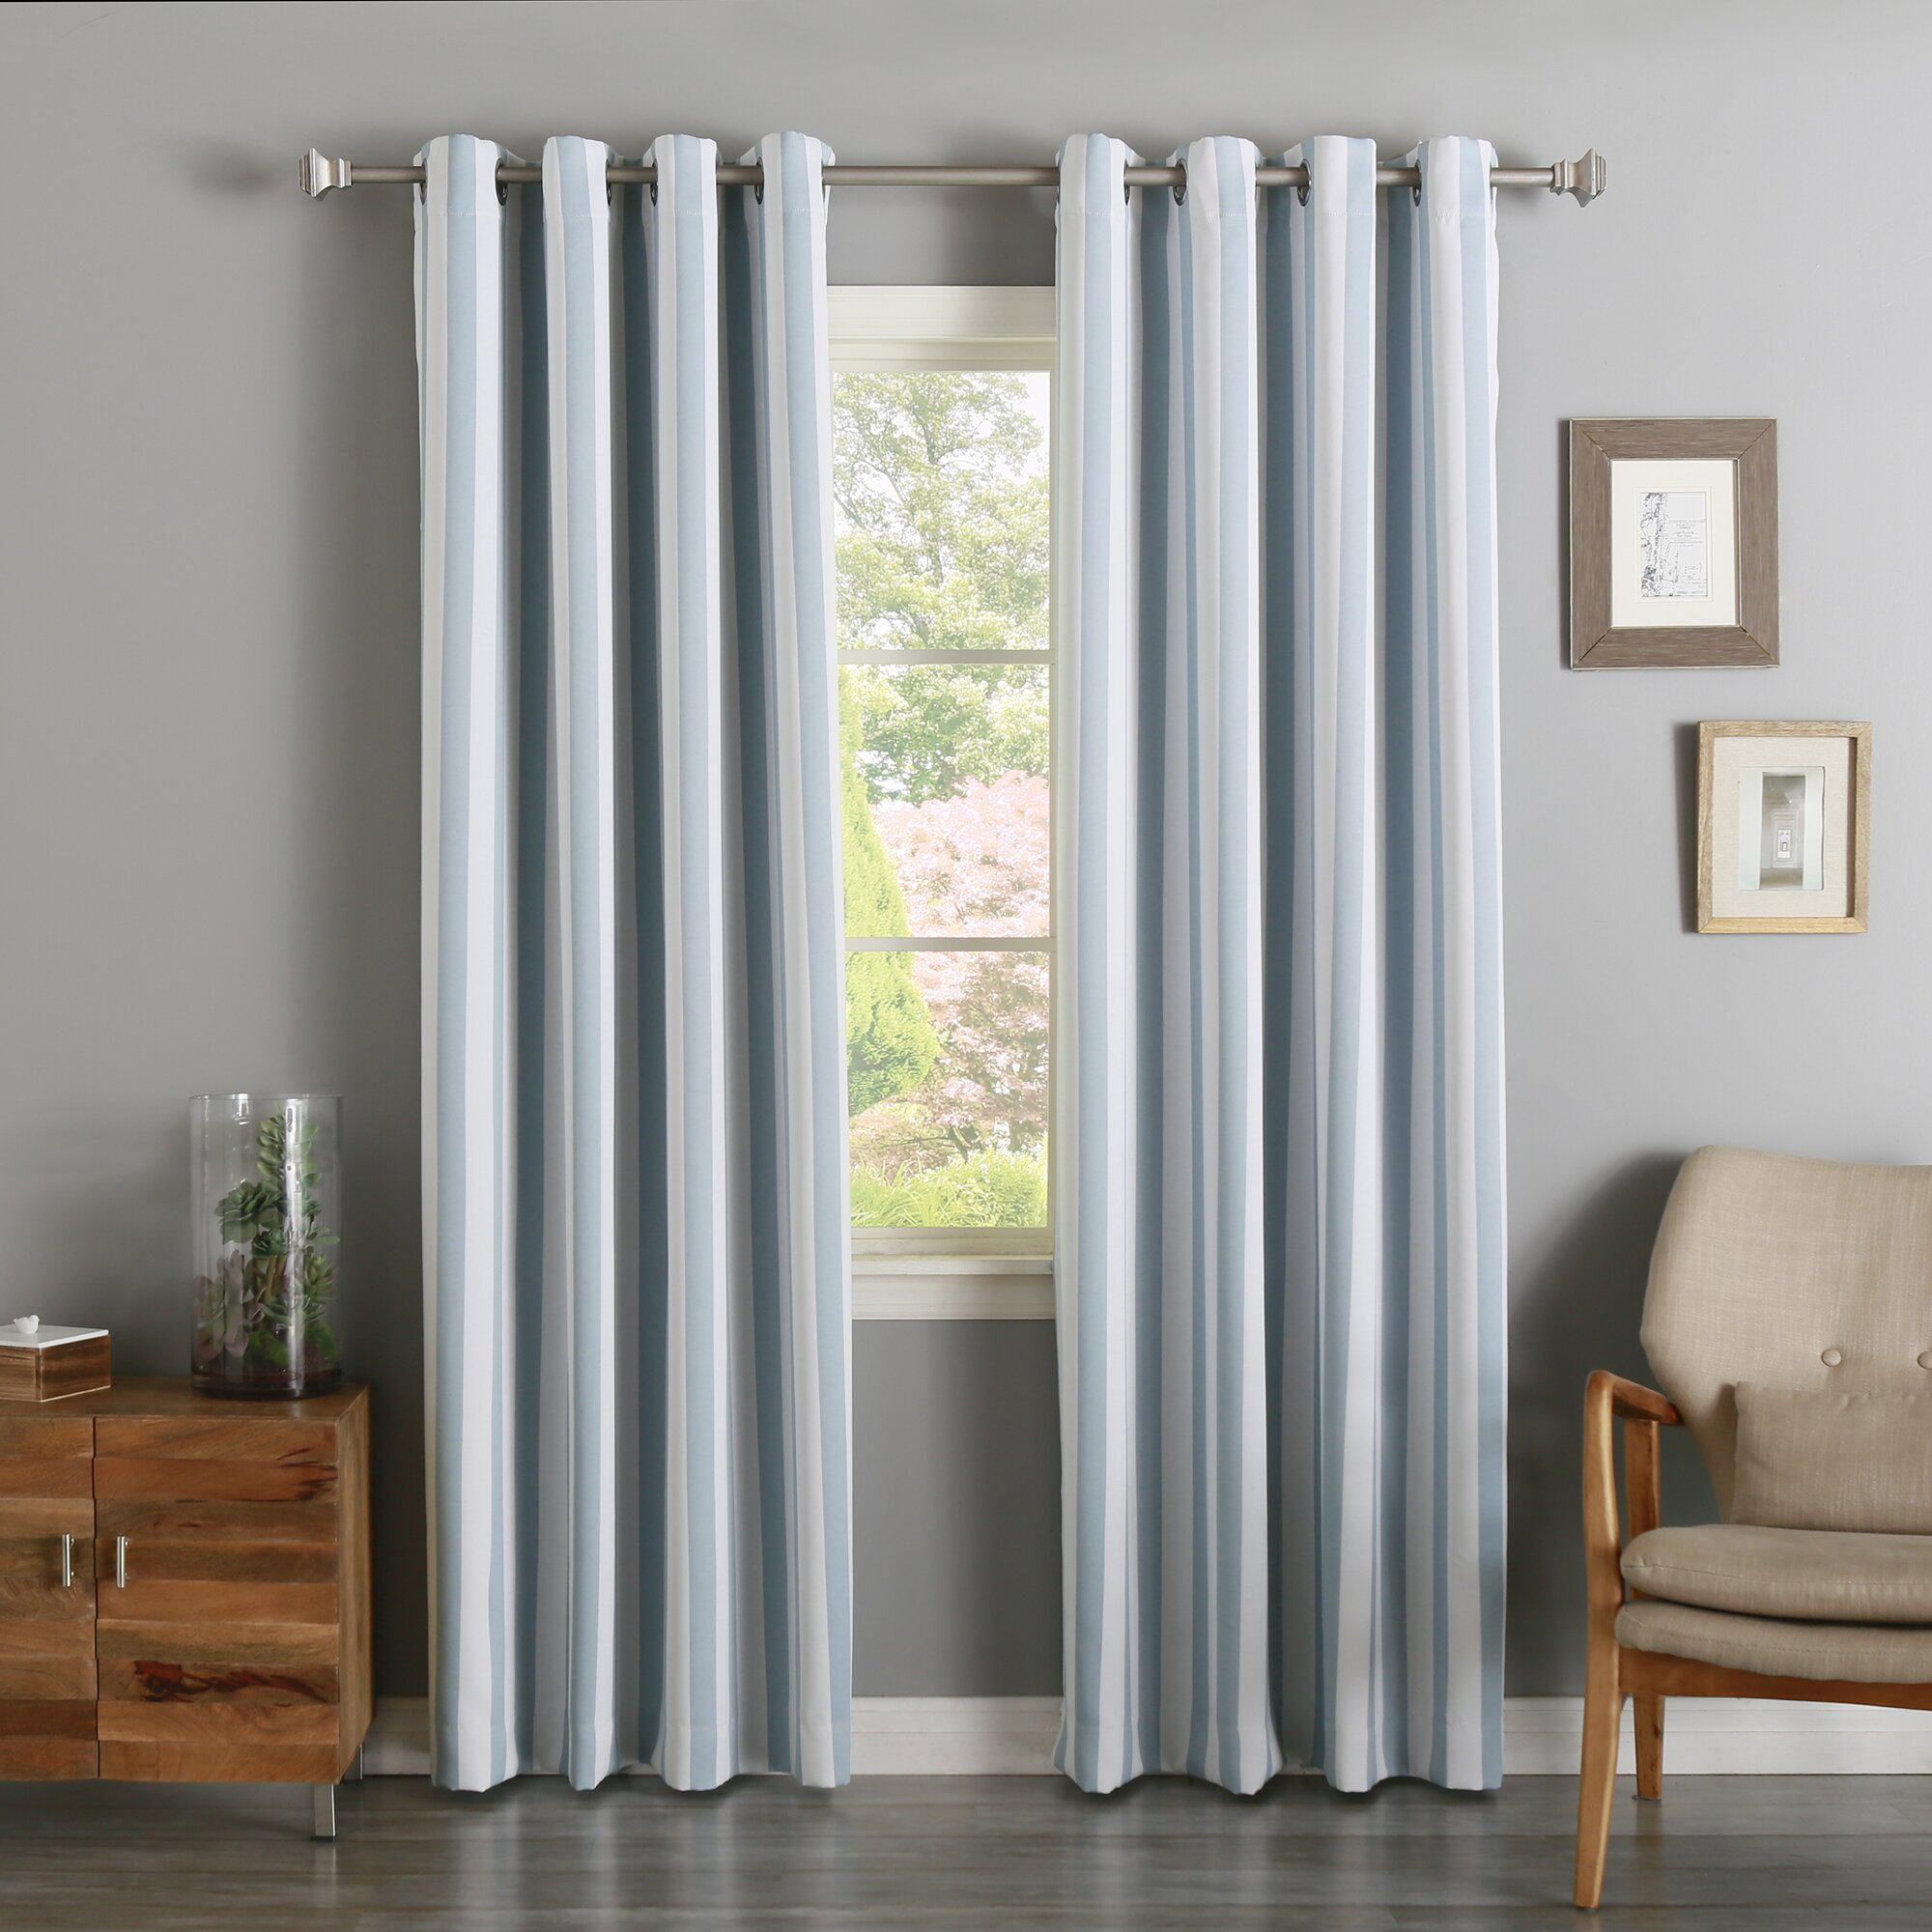 Best Home Fashion, Inc. Striped Semi-Sheer Grommet Curtain